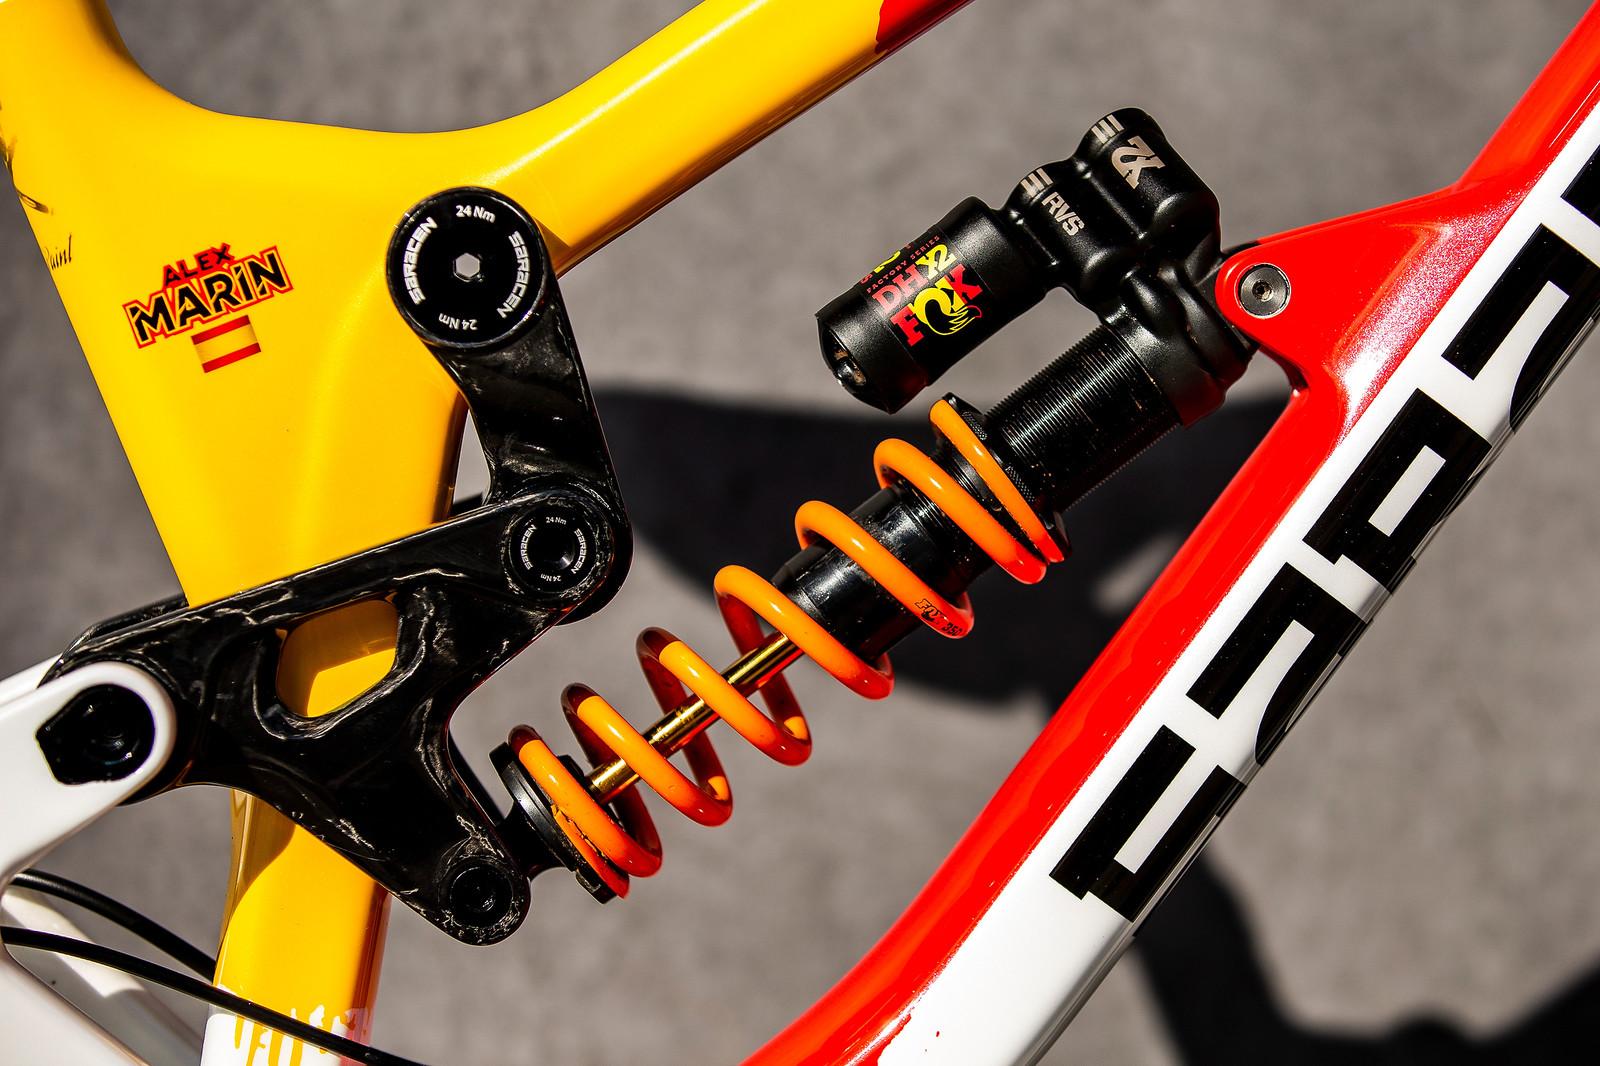 FOX DHX2 - WORLD CHAMPS BIKE - Alex Marin's Saracen Myst - Mountain Biking Pictures - Vital MTB